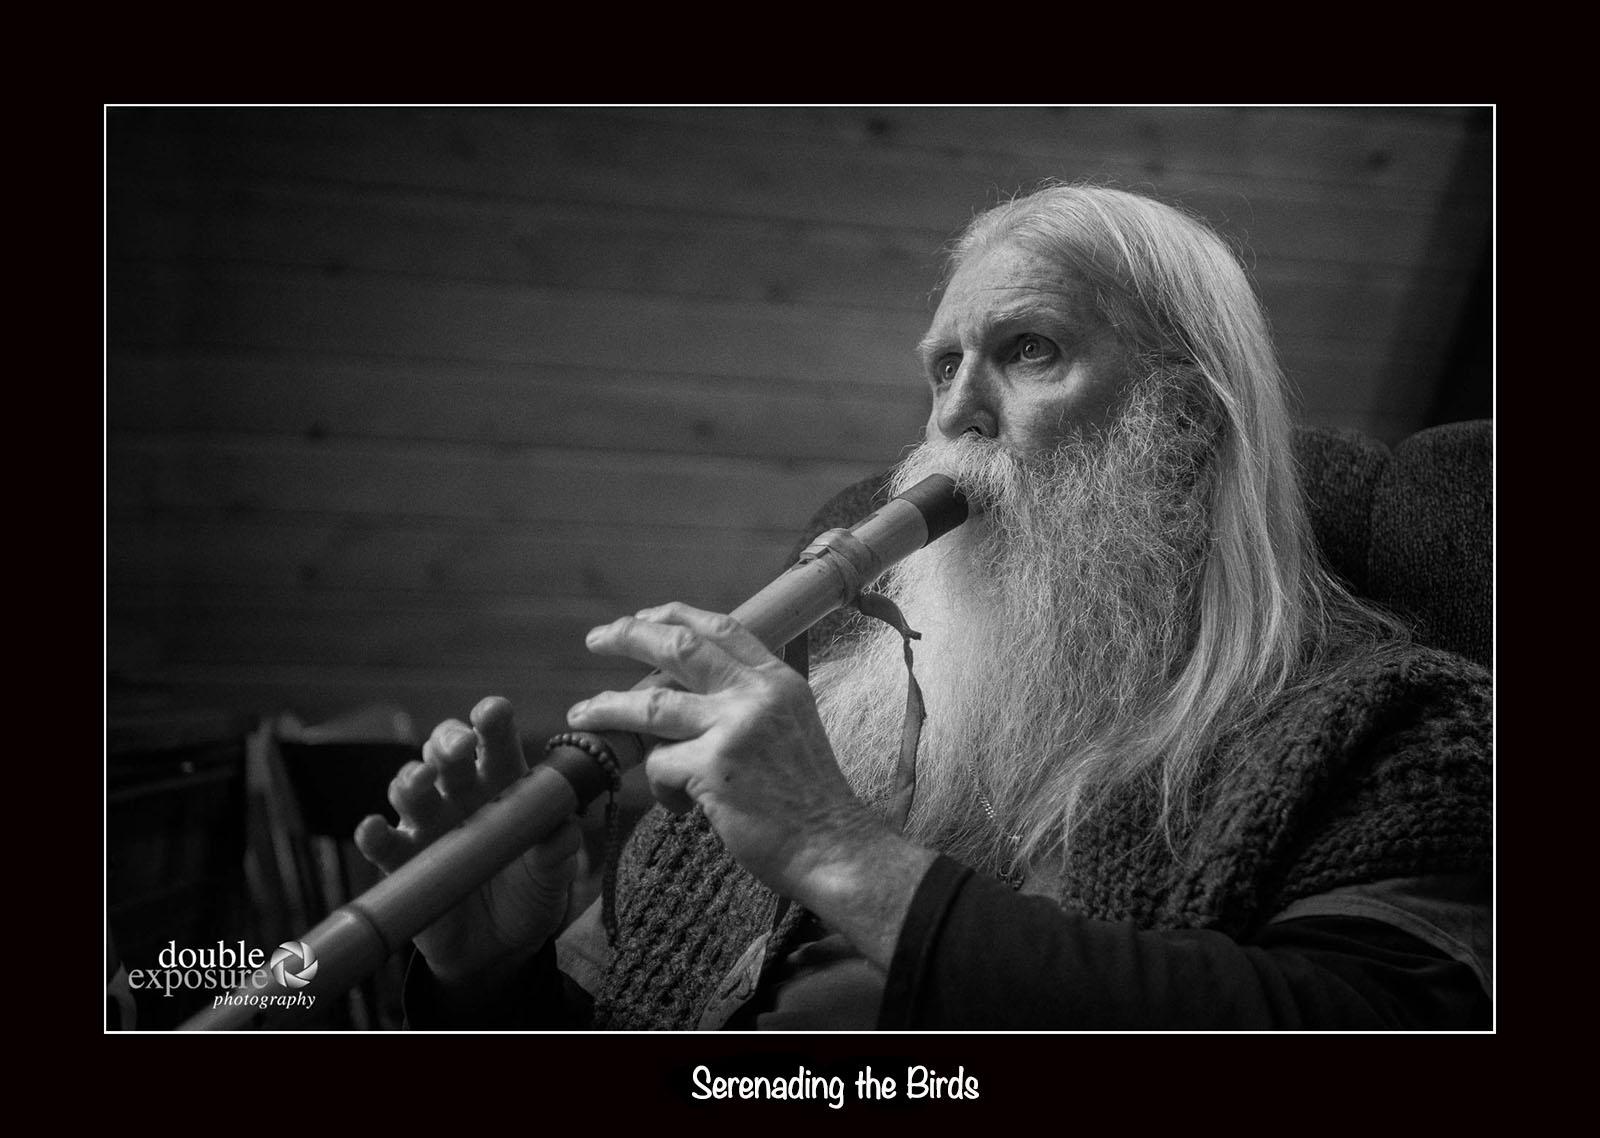 man plays flute for birds